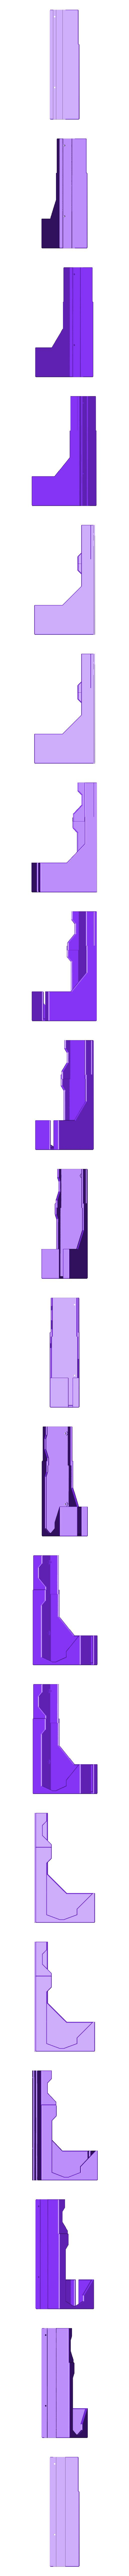 PSU MOUNT TALL.stl Download free STL file Quick Detachable Ender 3 PSU Power Supply MOUNT • 3D printer object, nrnathan